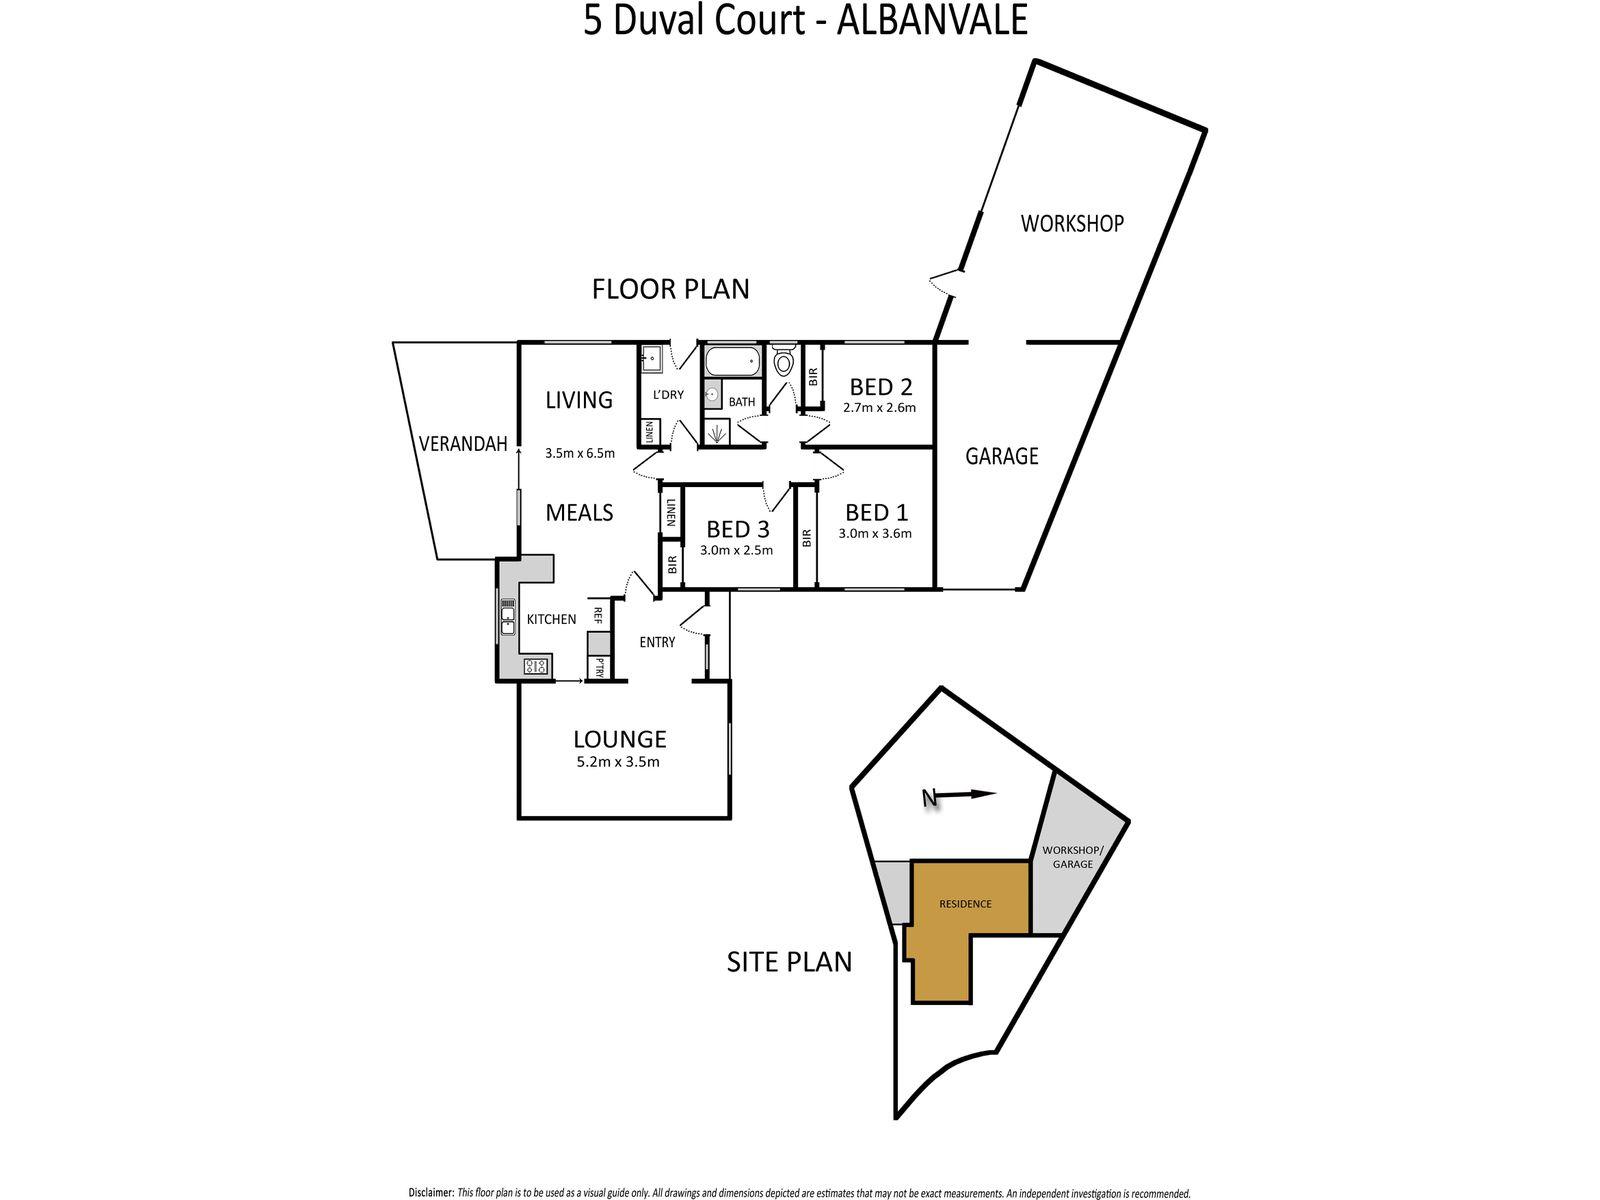 5 Duval Court, Albanvale